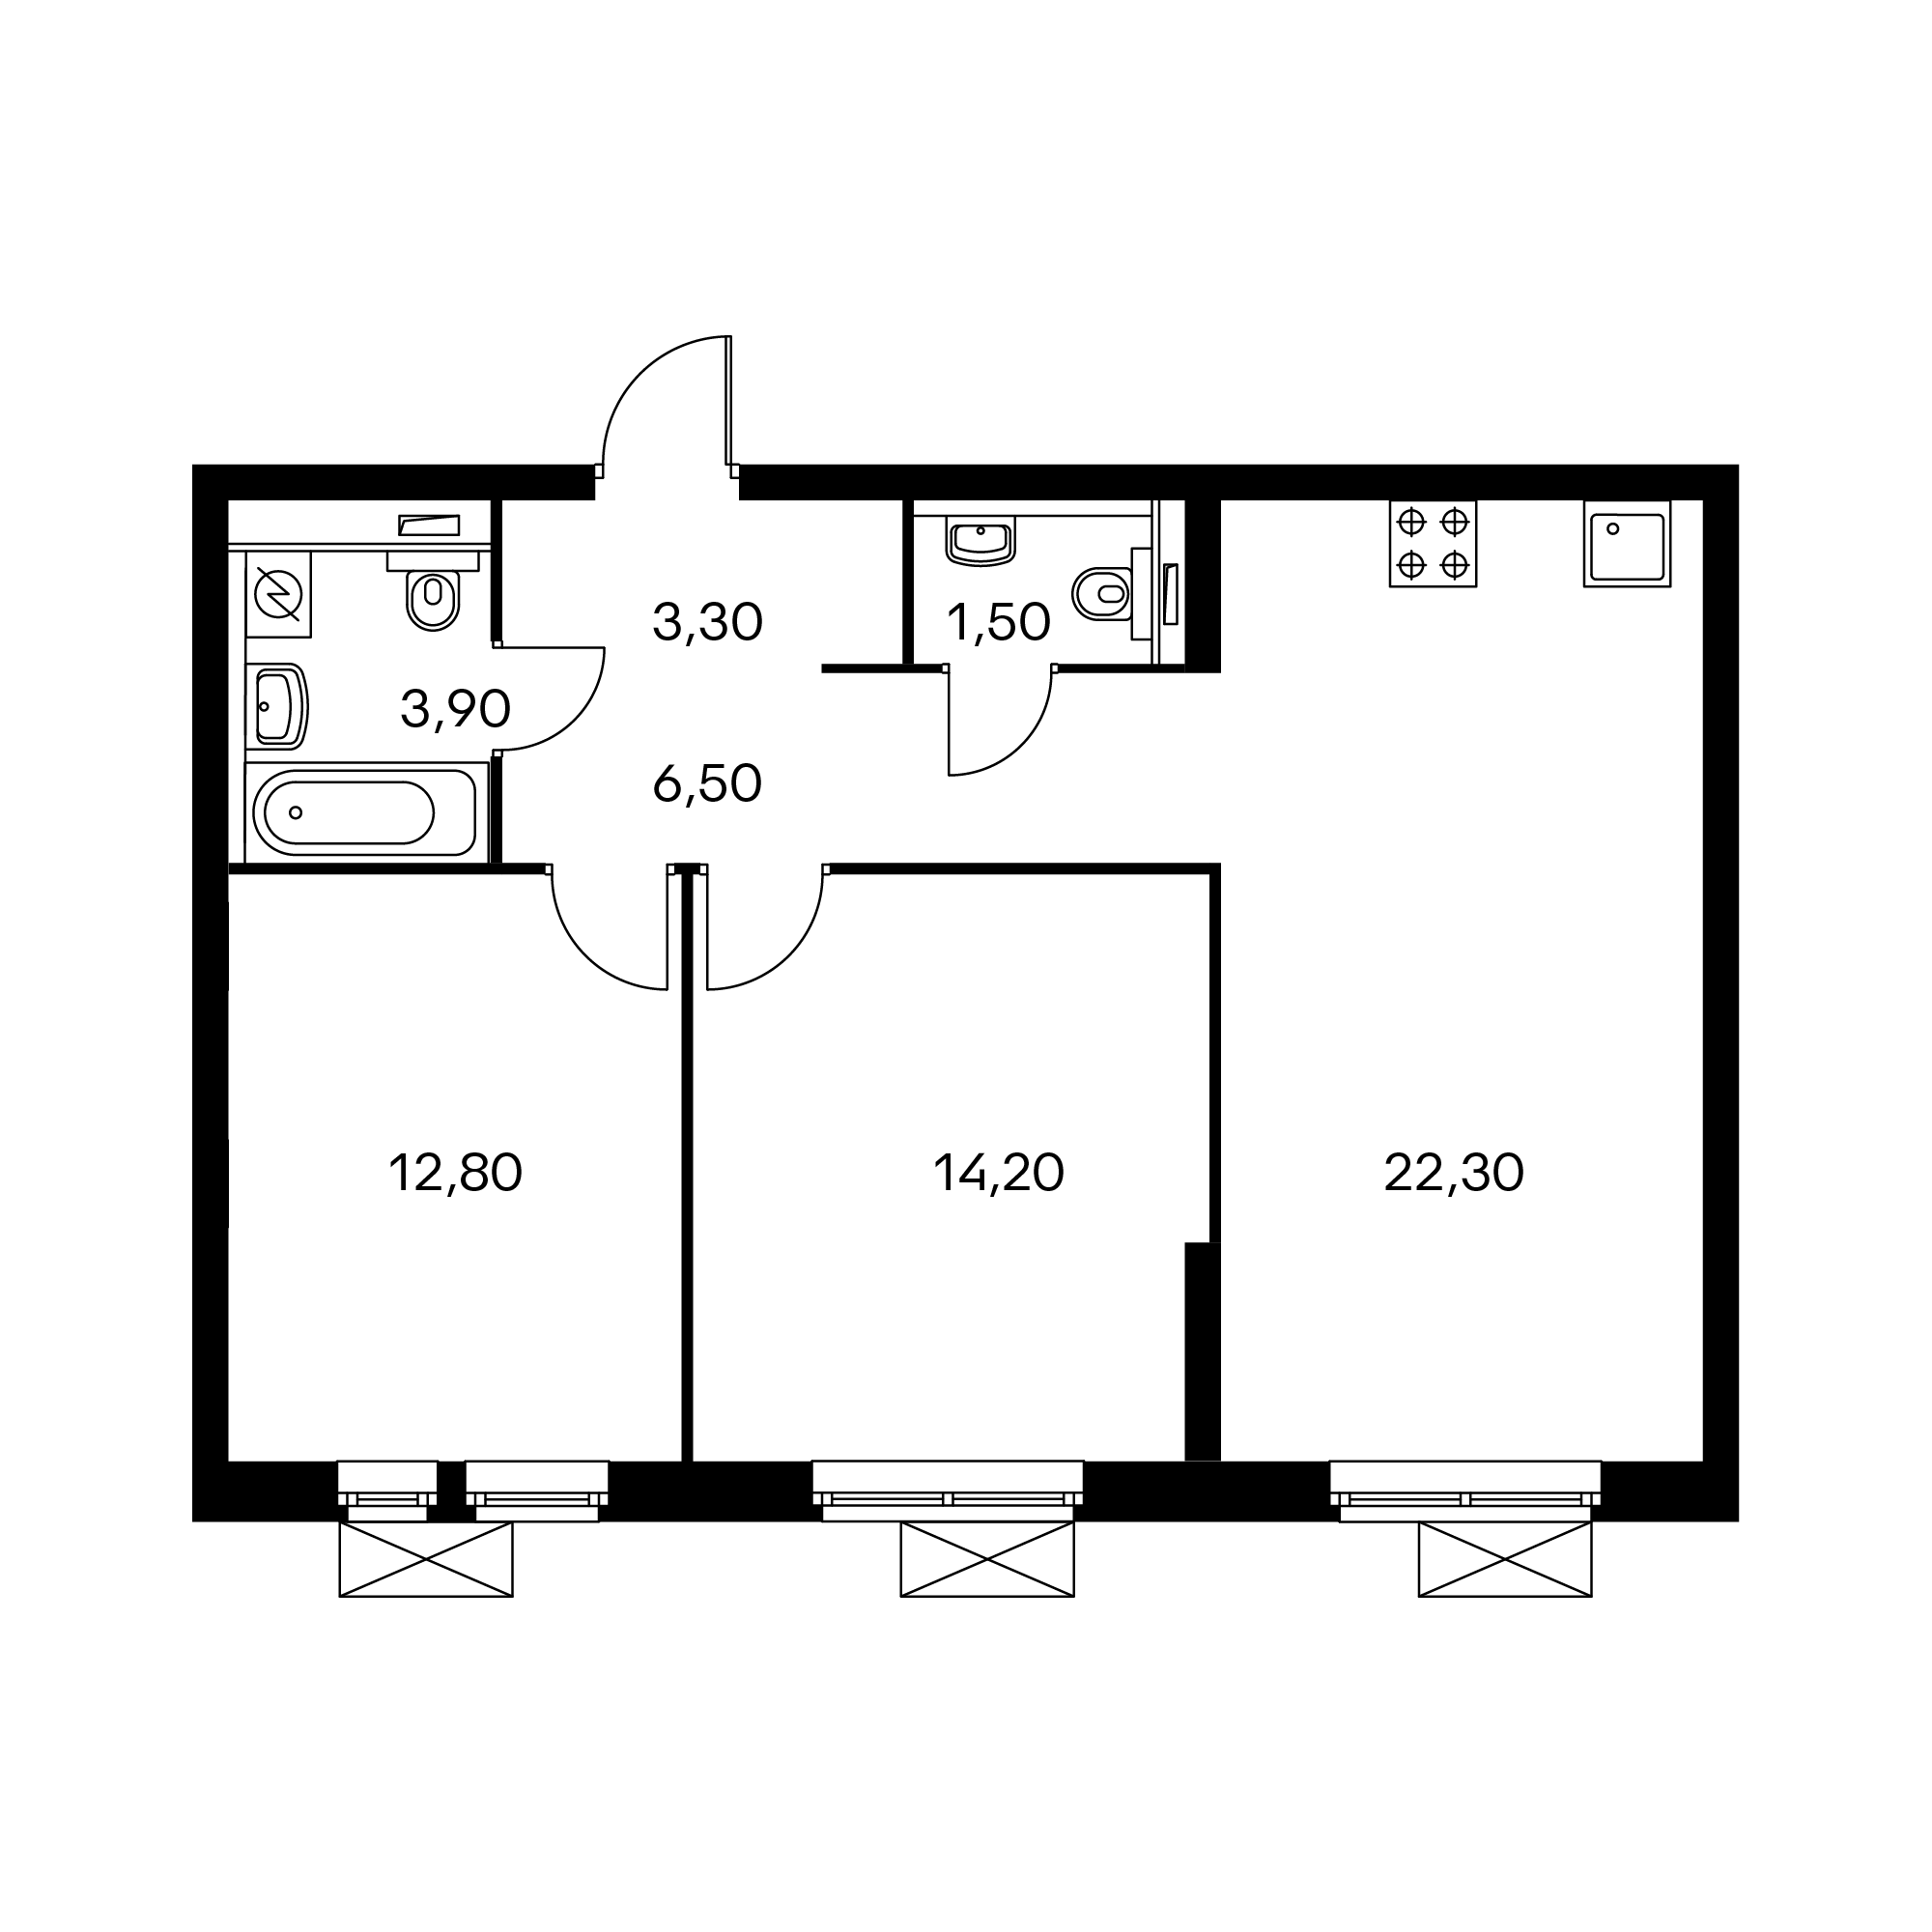 2EL1_10.5